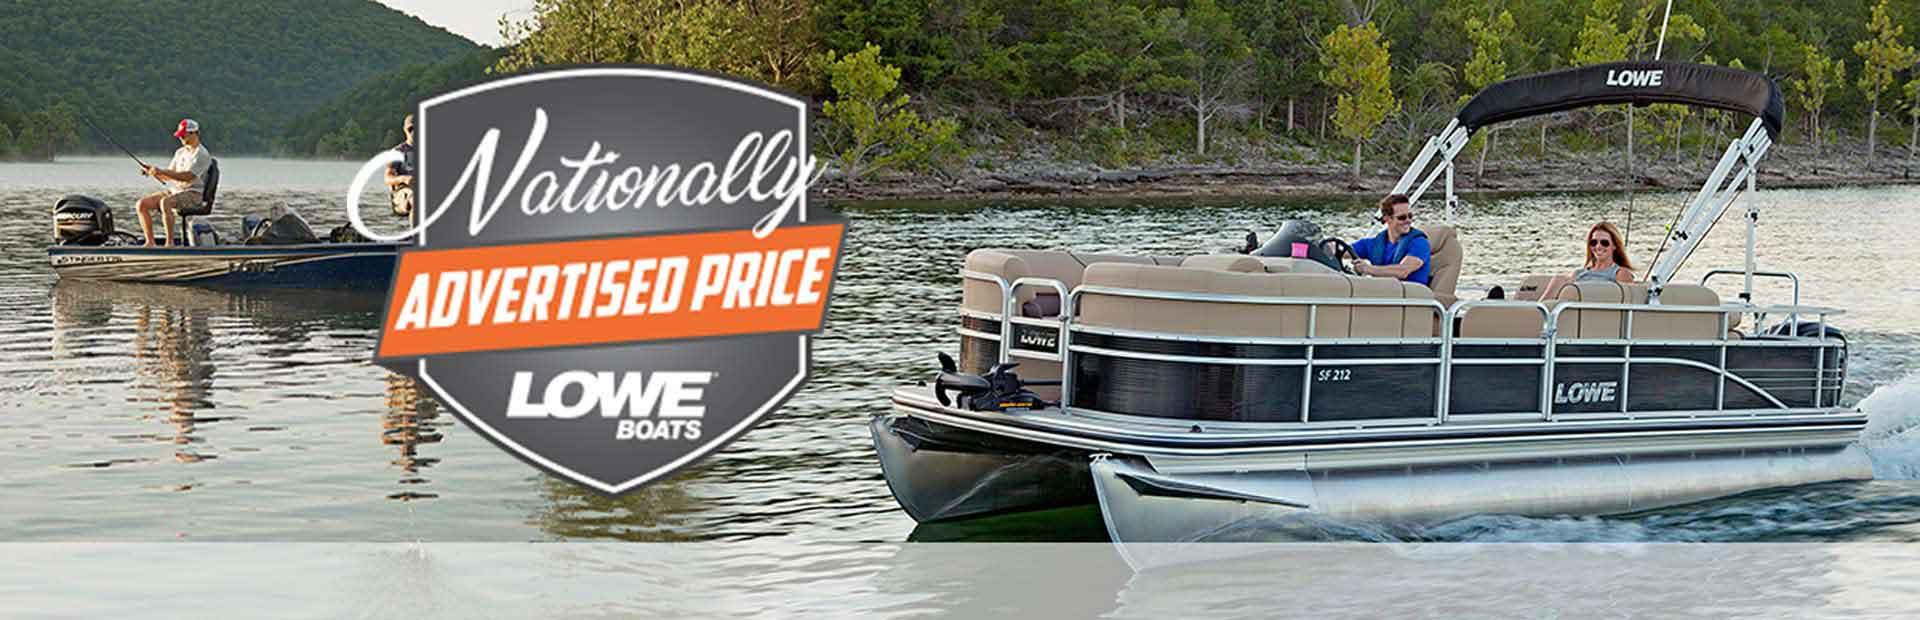 Power Lodge | Brainerd, MN | Powersports, Golf Carts, Boat